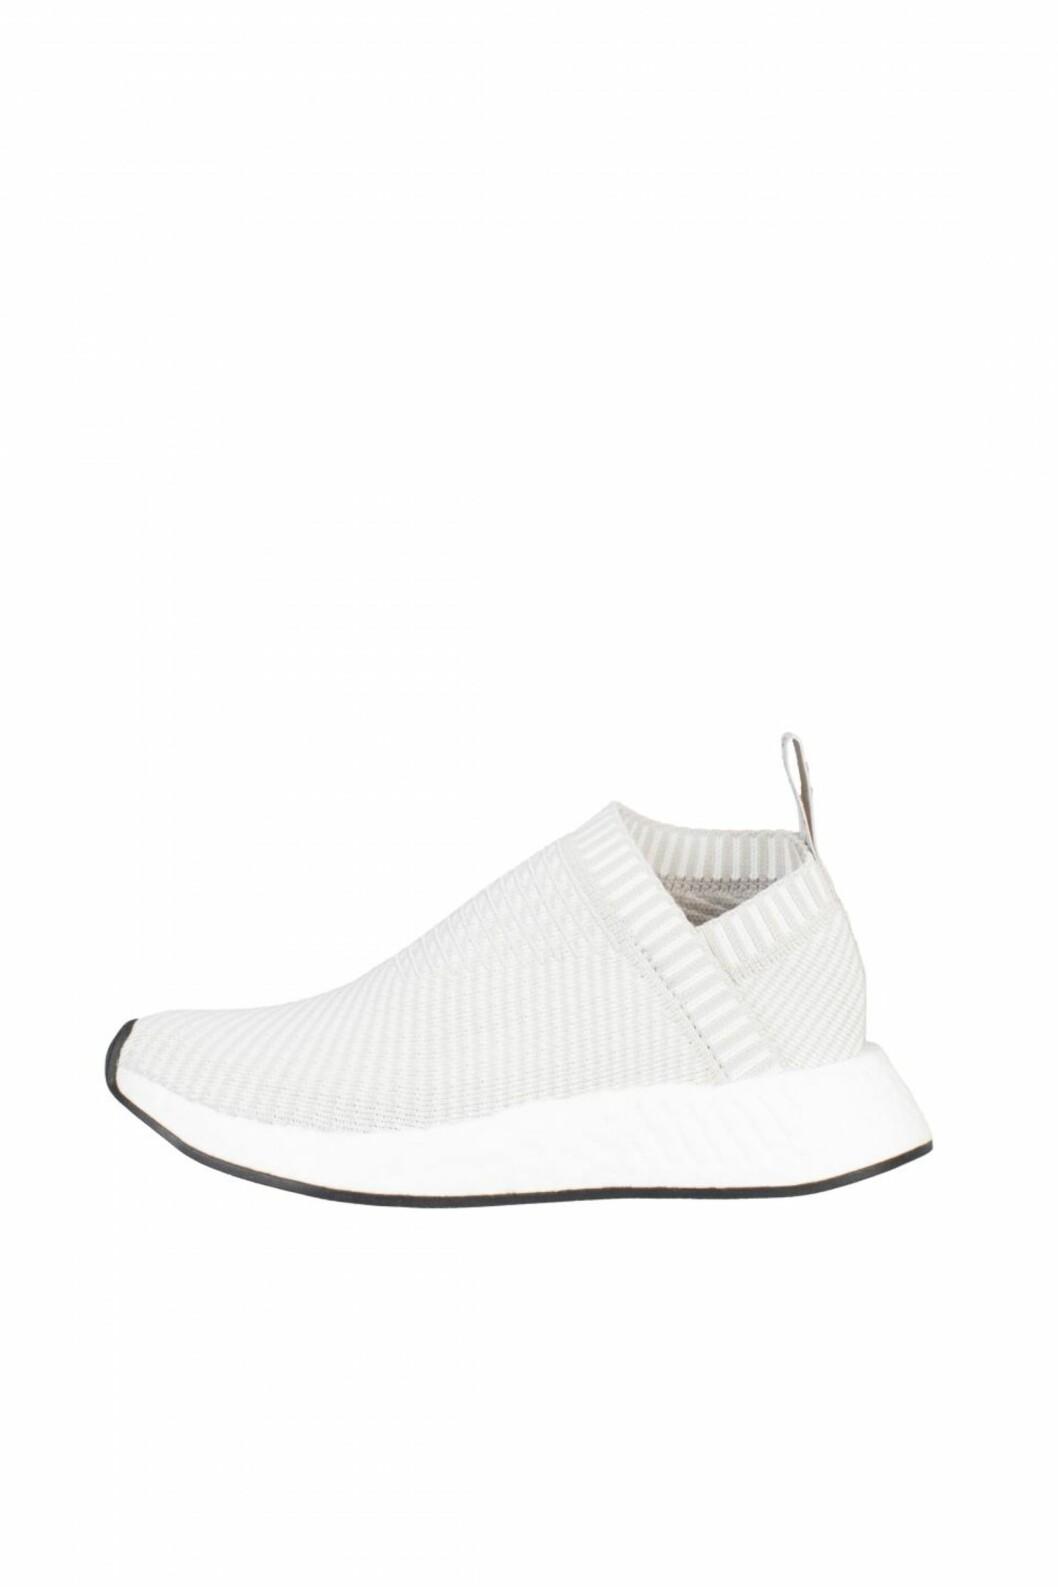 Sko fra Adidas via Bogartstore.no | kr 1800 | https://track.adtraction.com/t/t?a=1127626678&as=1115634940&t=2&tk=1&url=https://bogartstore.no/shop/dame/nmd_cs2/